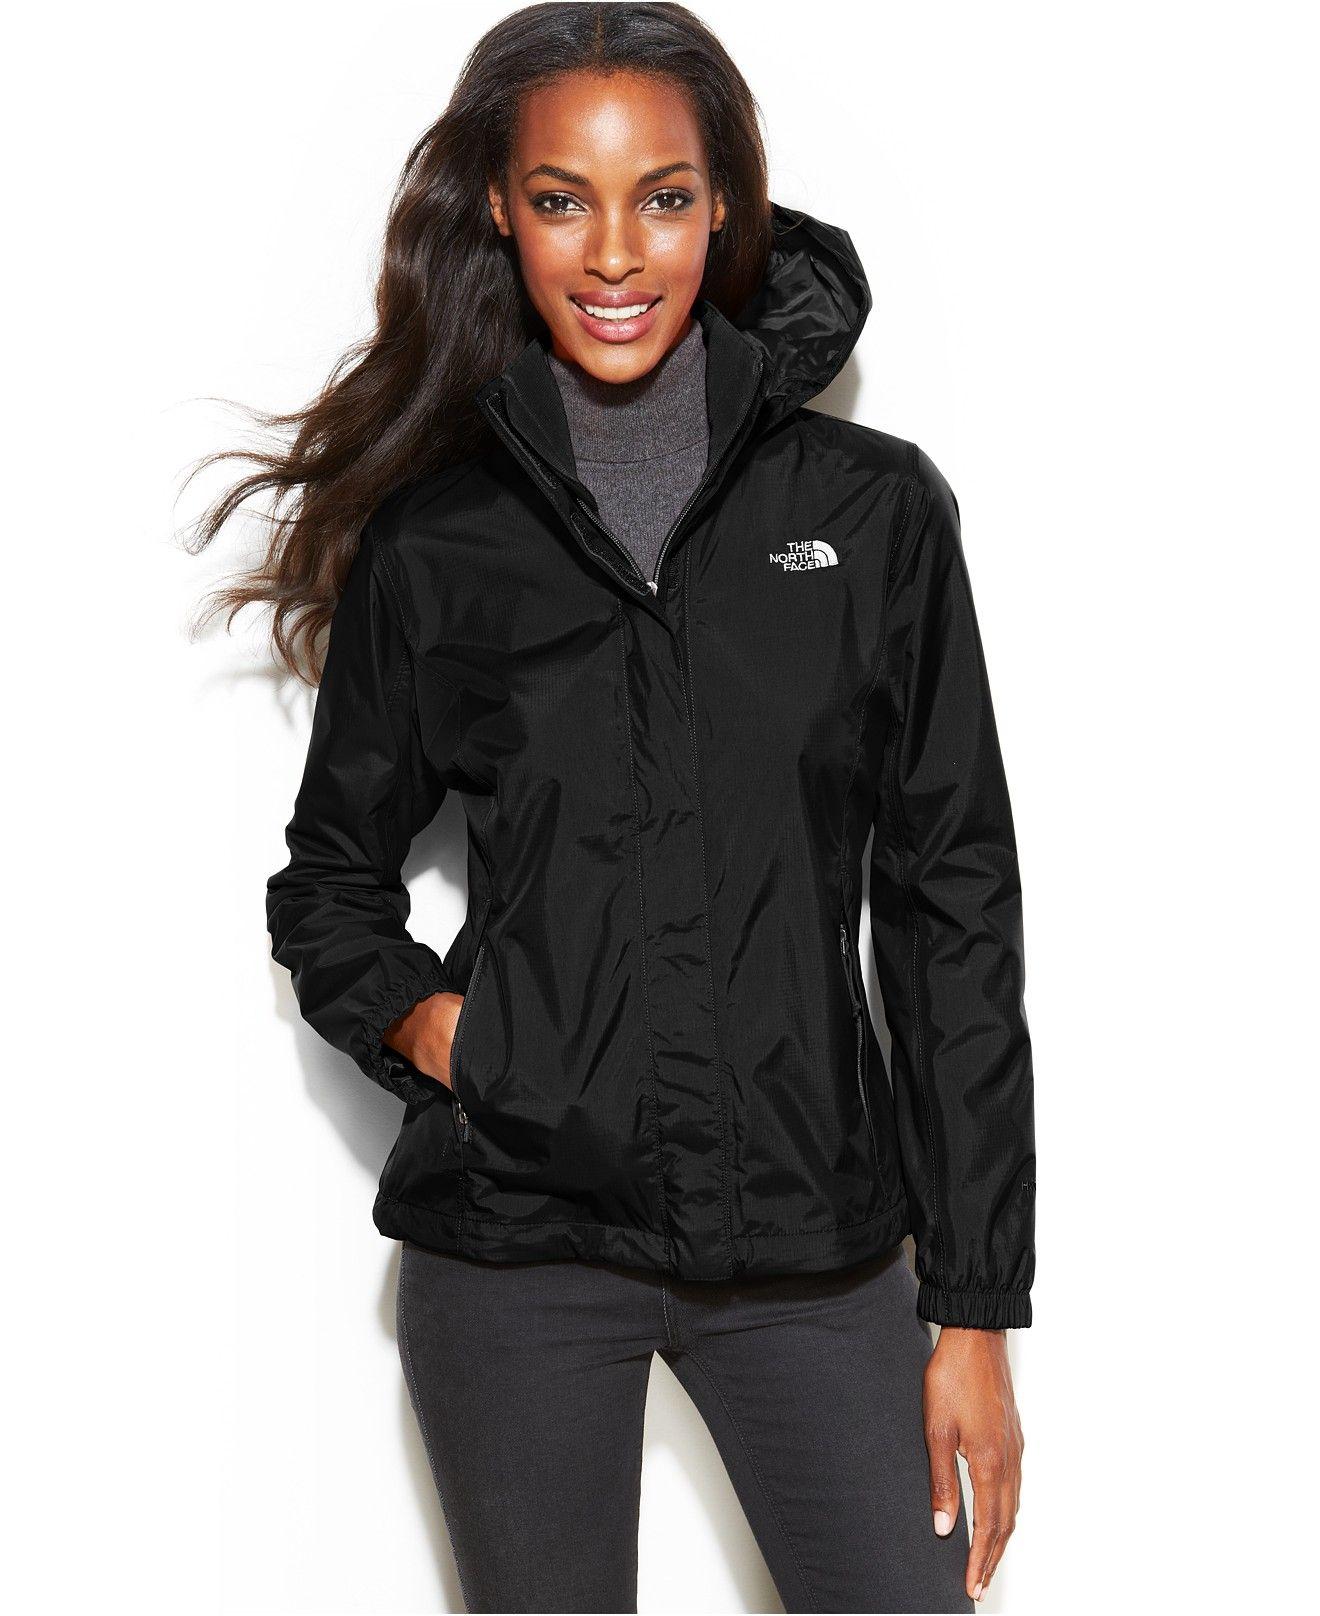 4a802a4292 The North Face Resolve Waterproof Jacket - Jackets   Blazers - Women -  Macy s